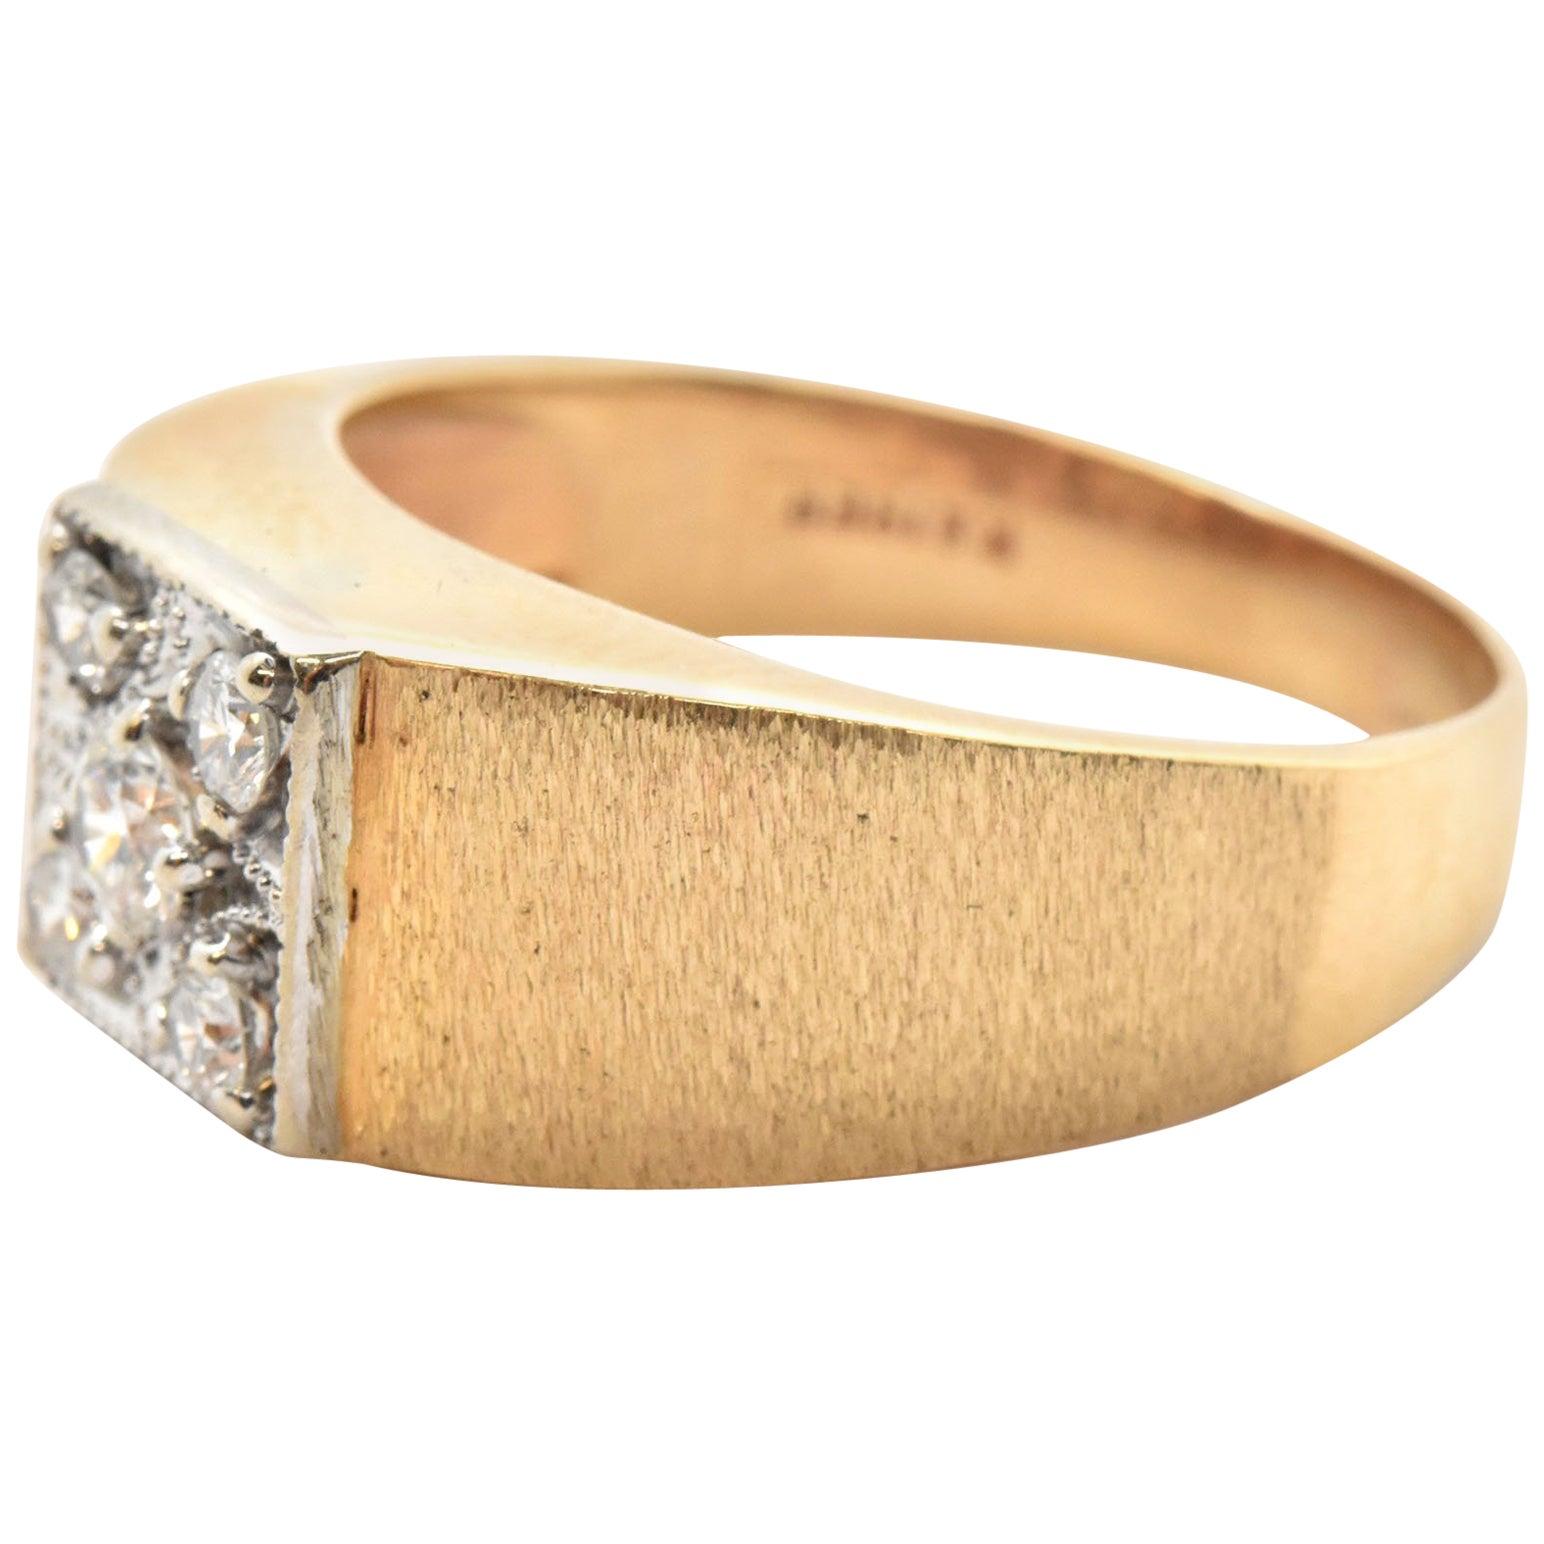 10c5d1f499a10 Men's La Kaiser 14 Karat Yellow Gold and Round Brilliant Diamond Ring